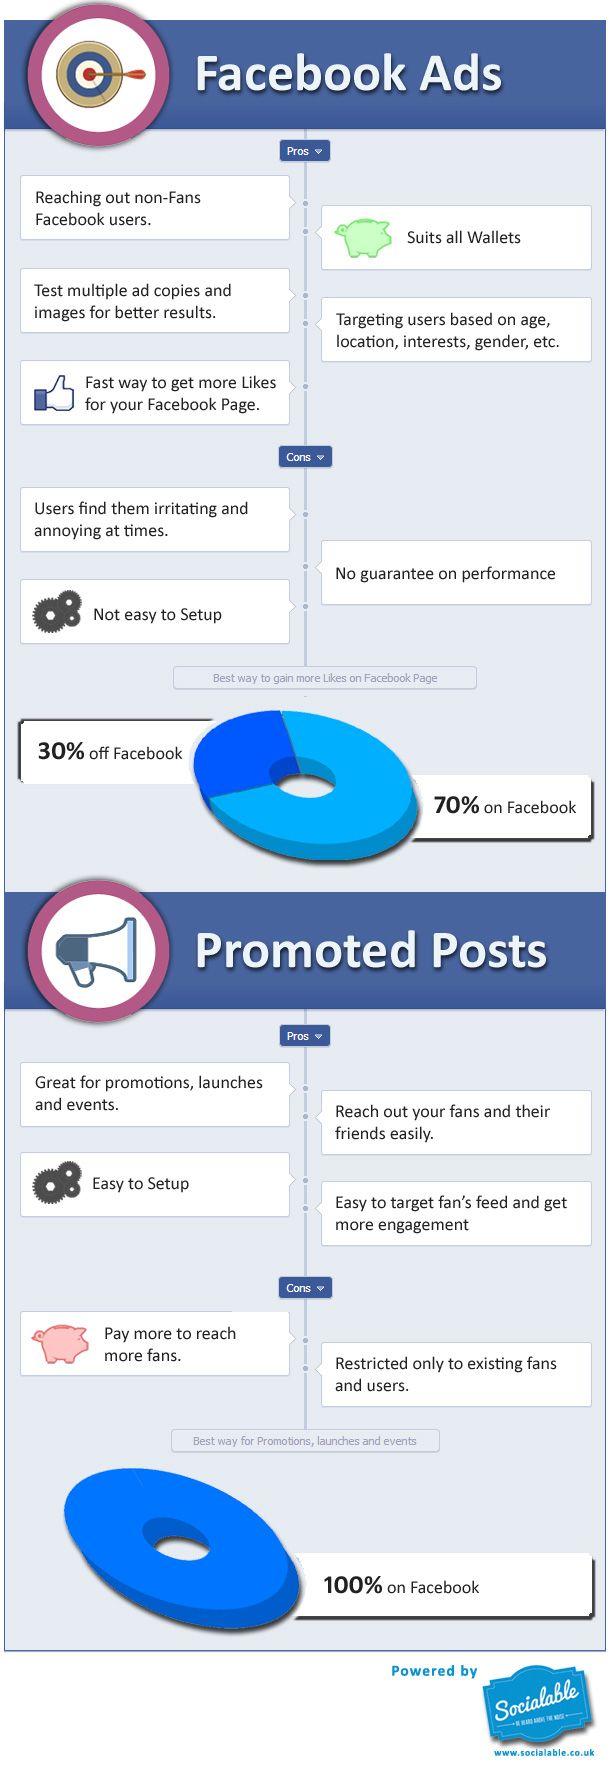 Facebook Ads vs. Facebook Promoted Posts [INFOGRAPHIC]